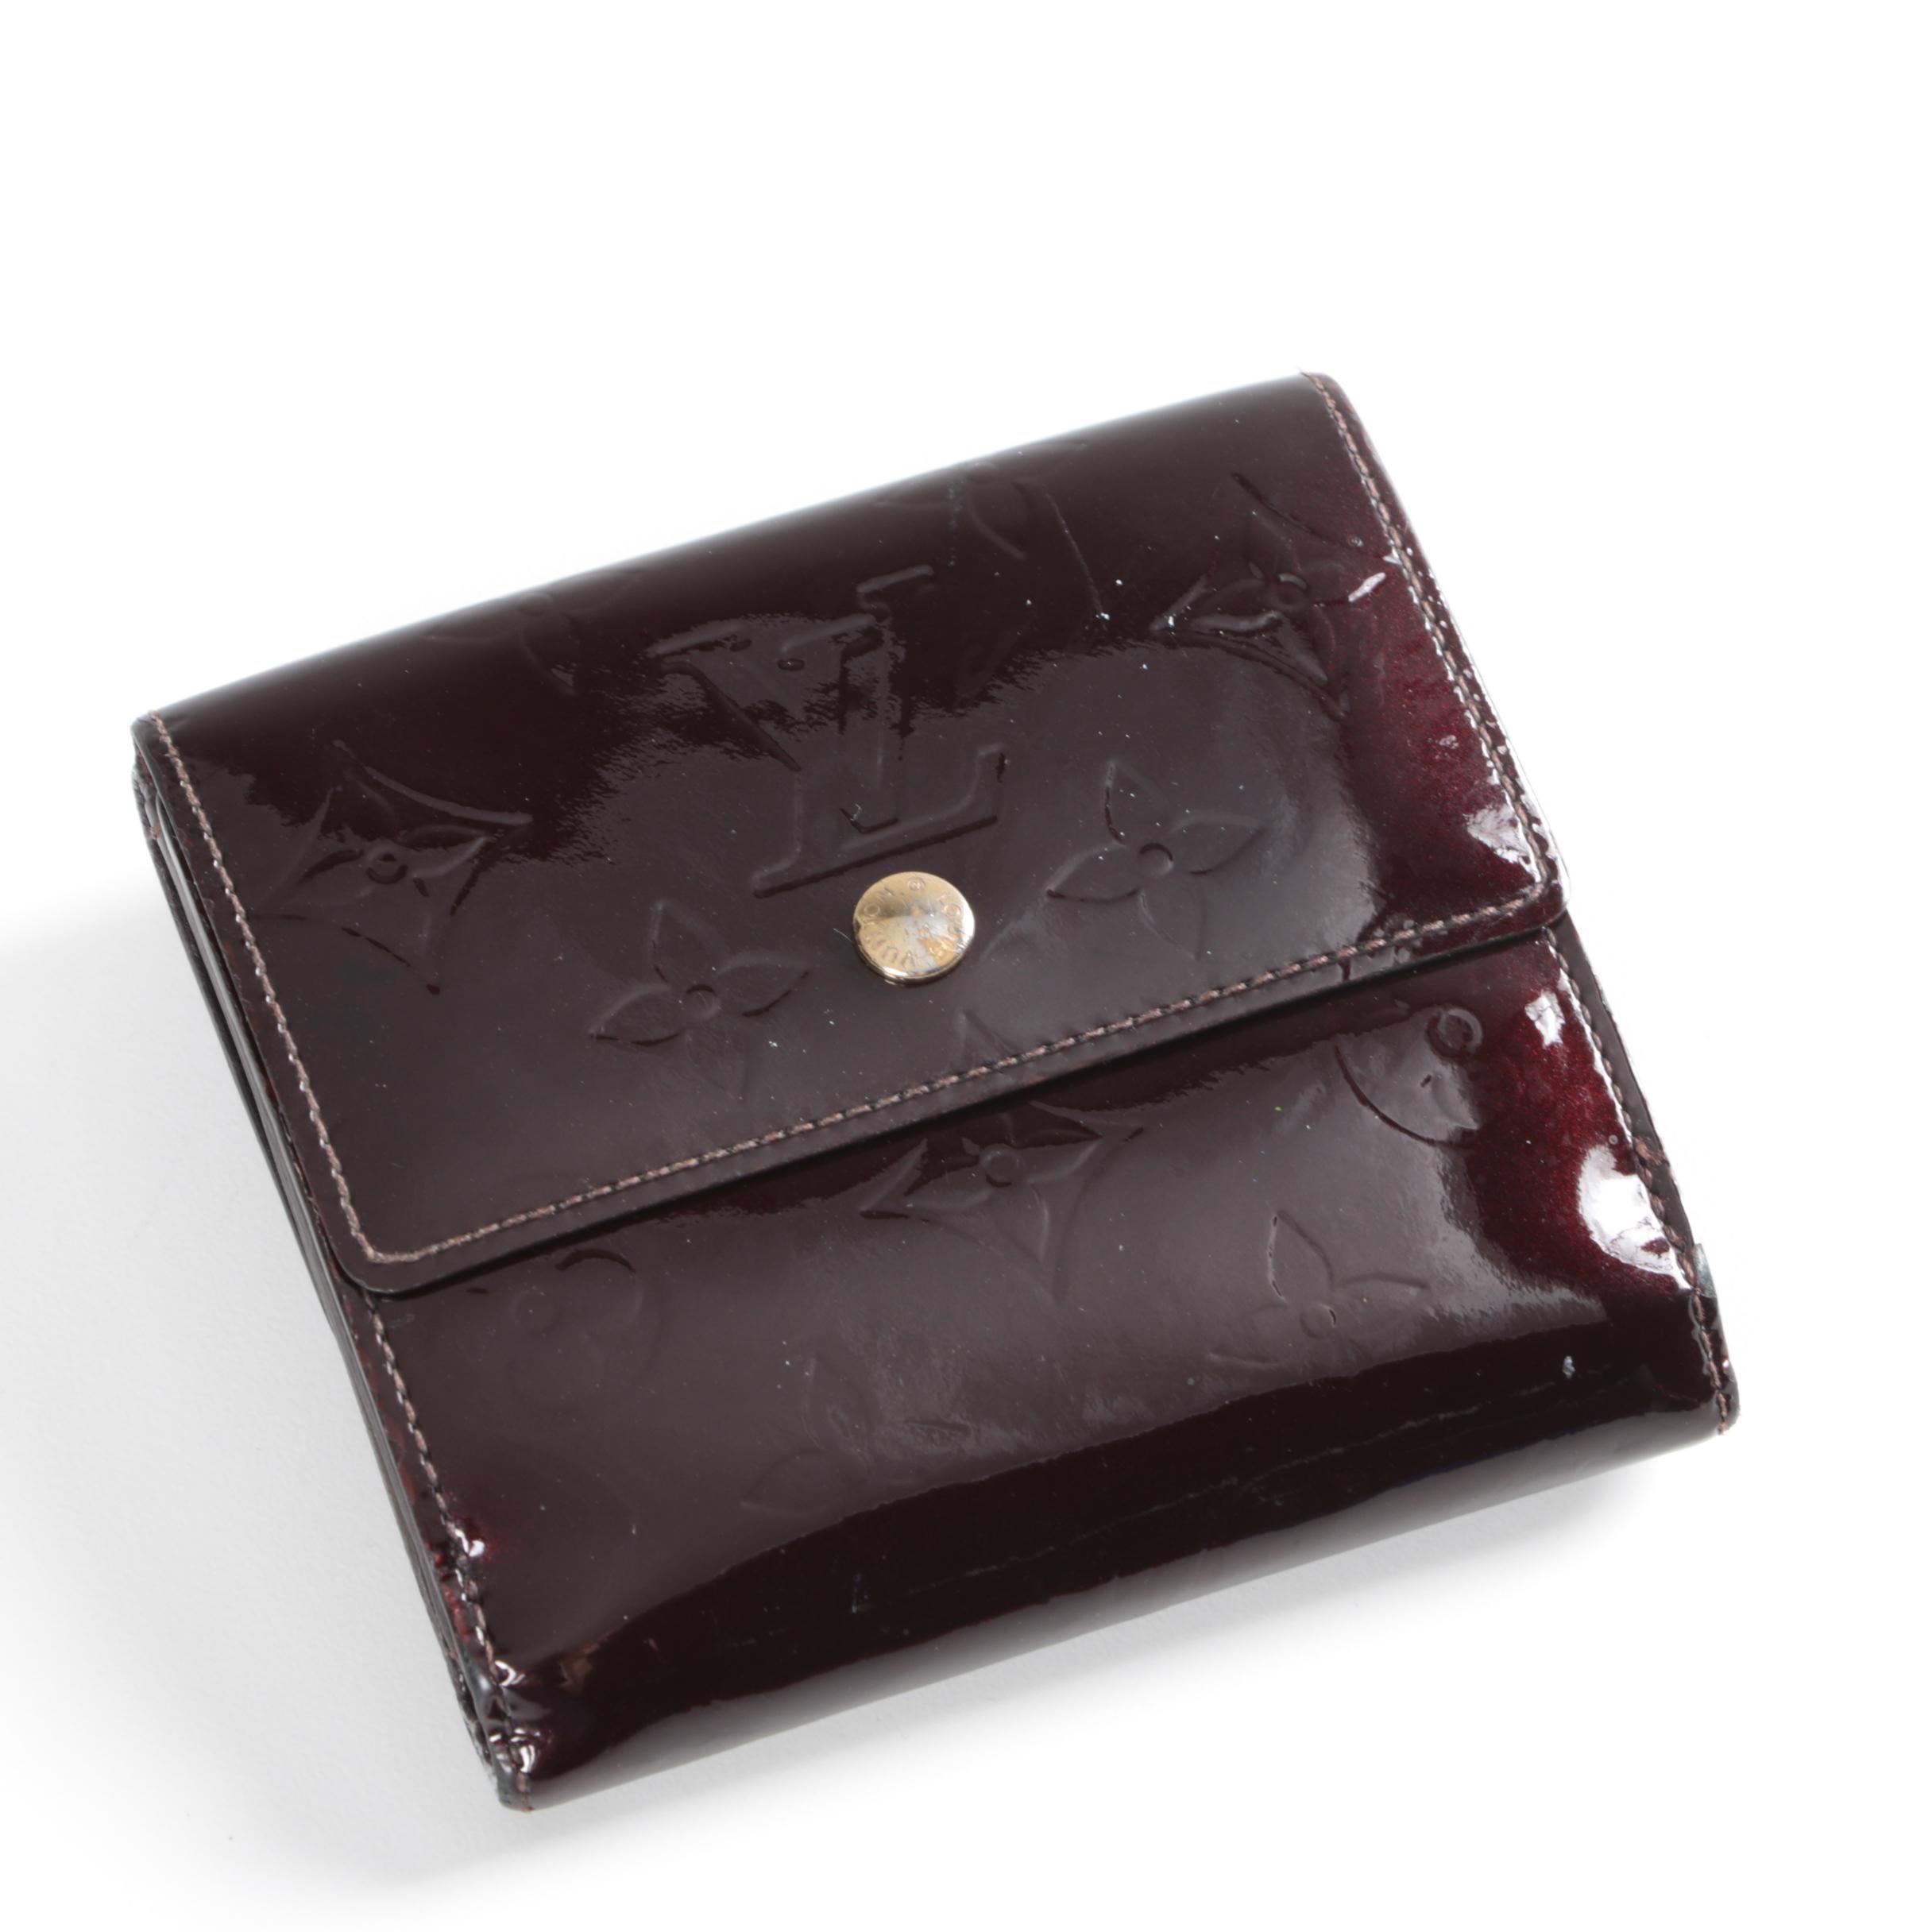 Louis Vuitton of Paris Burgundy Monogram Vernis Leather Elise Wallet